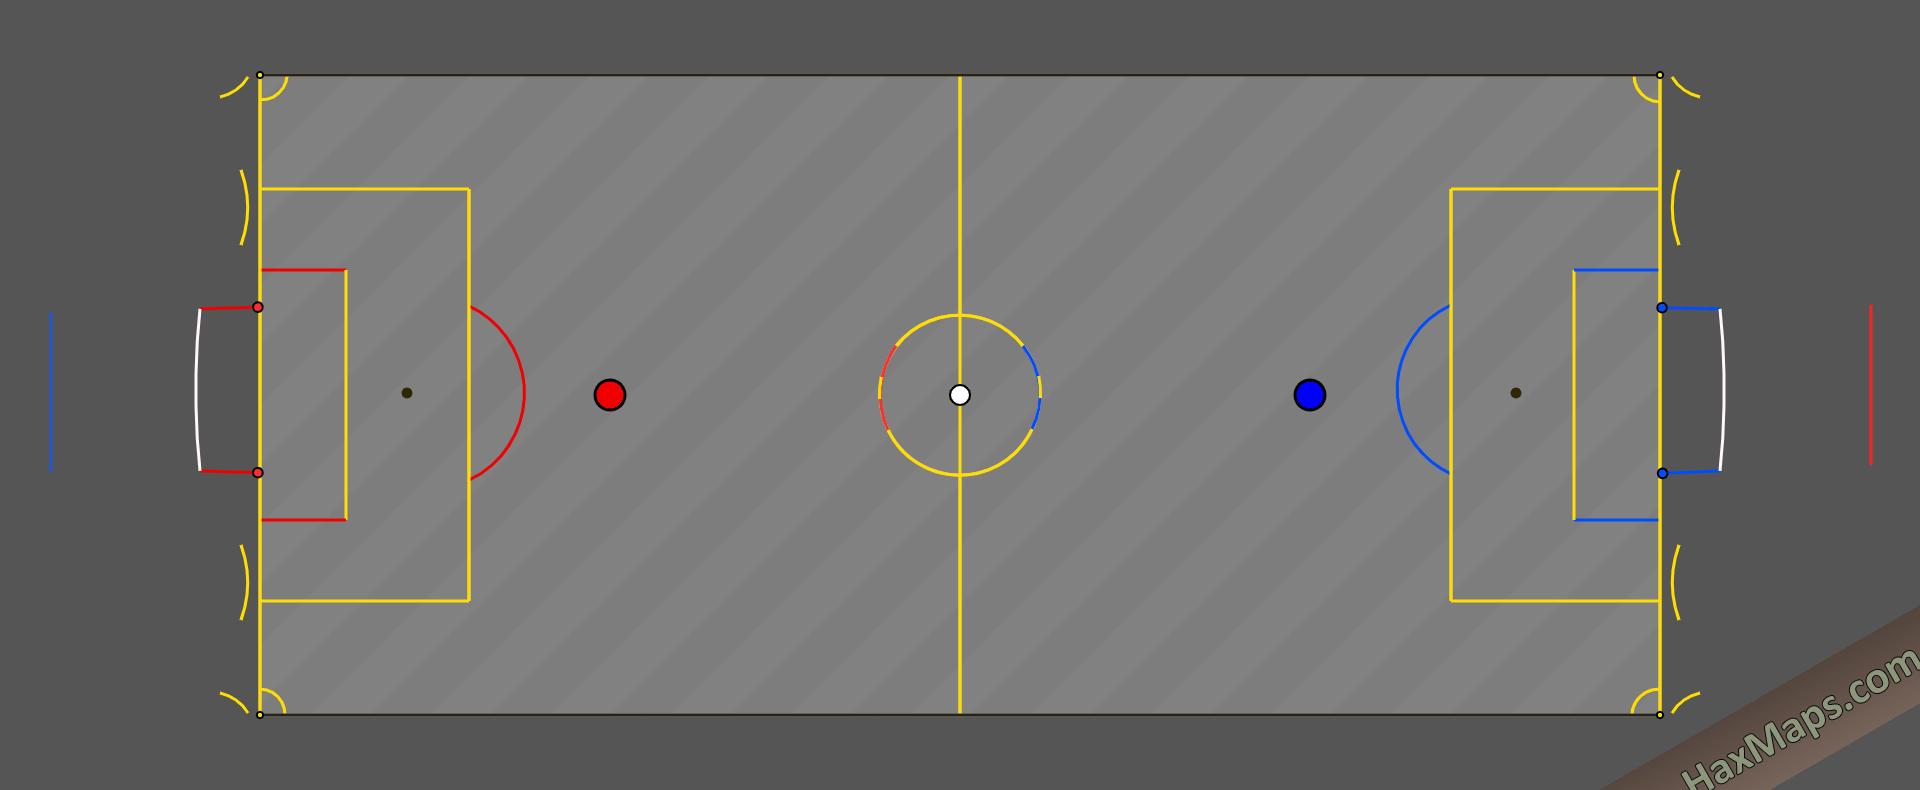 hax ball maps | Mini RS ▯ by rsk & GLH